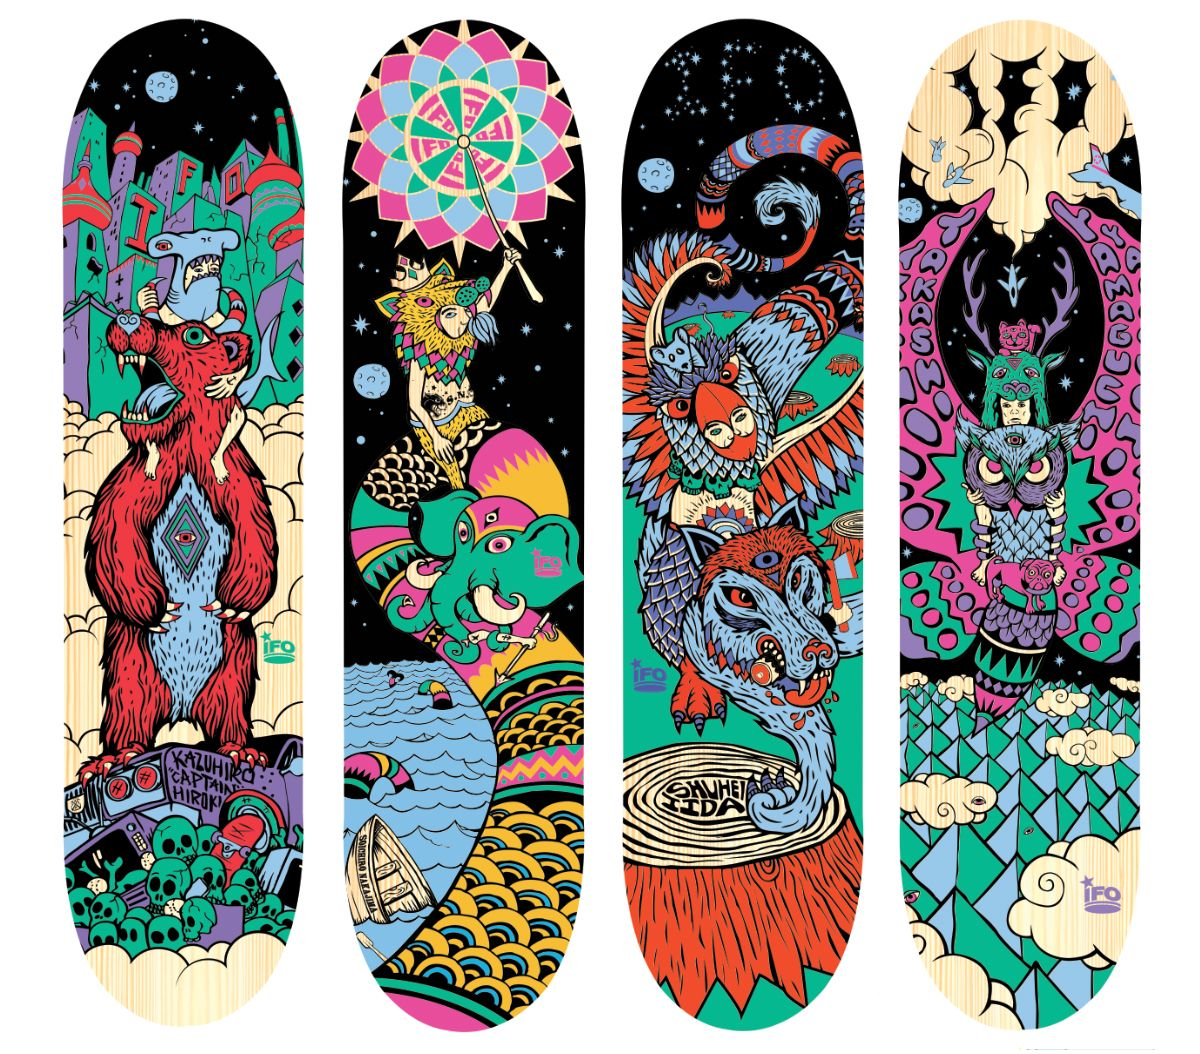 Shop - Clarity Skateboarding | Skateboard designs | Pinterest ...